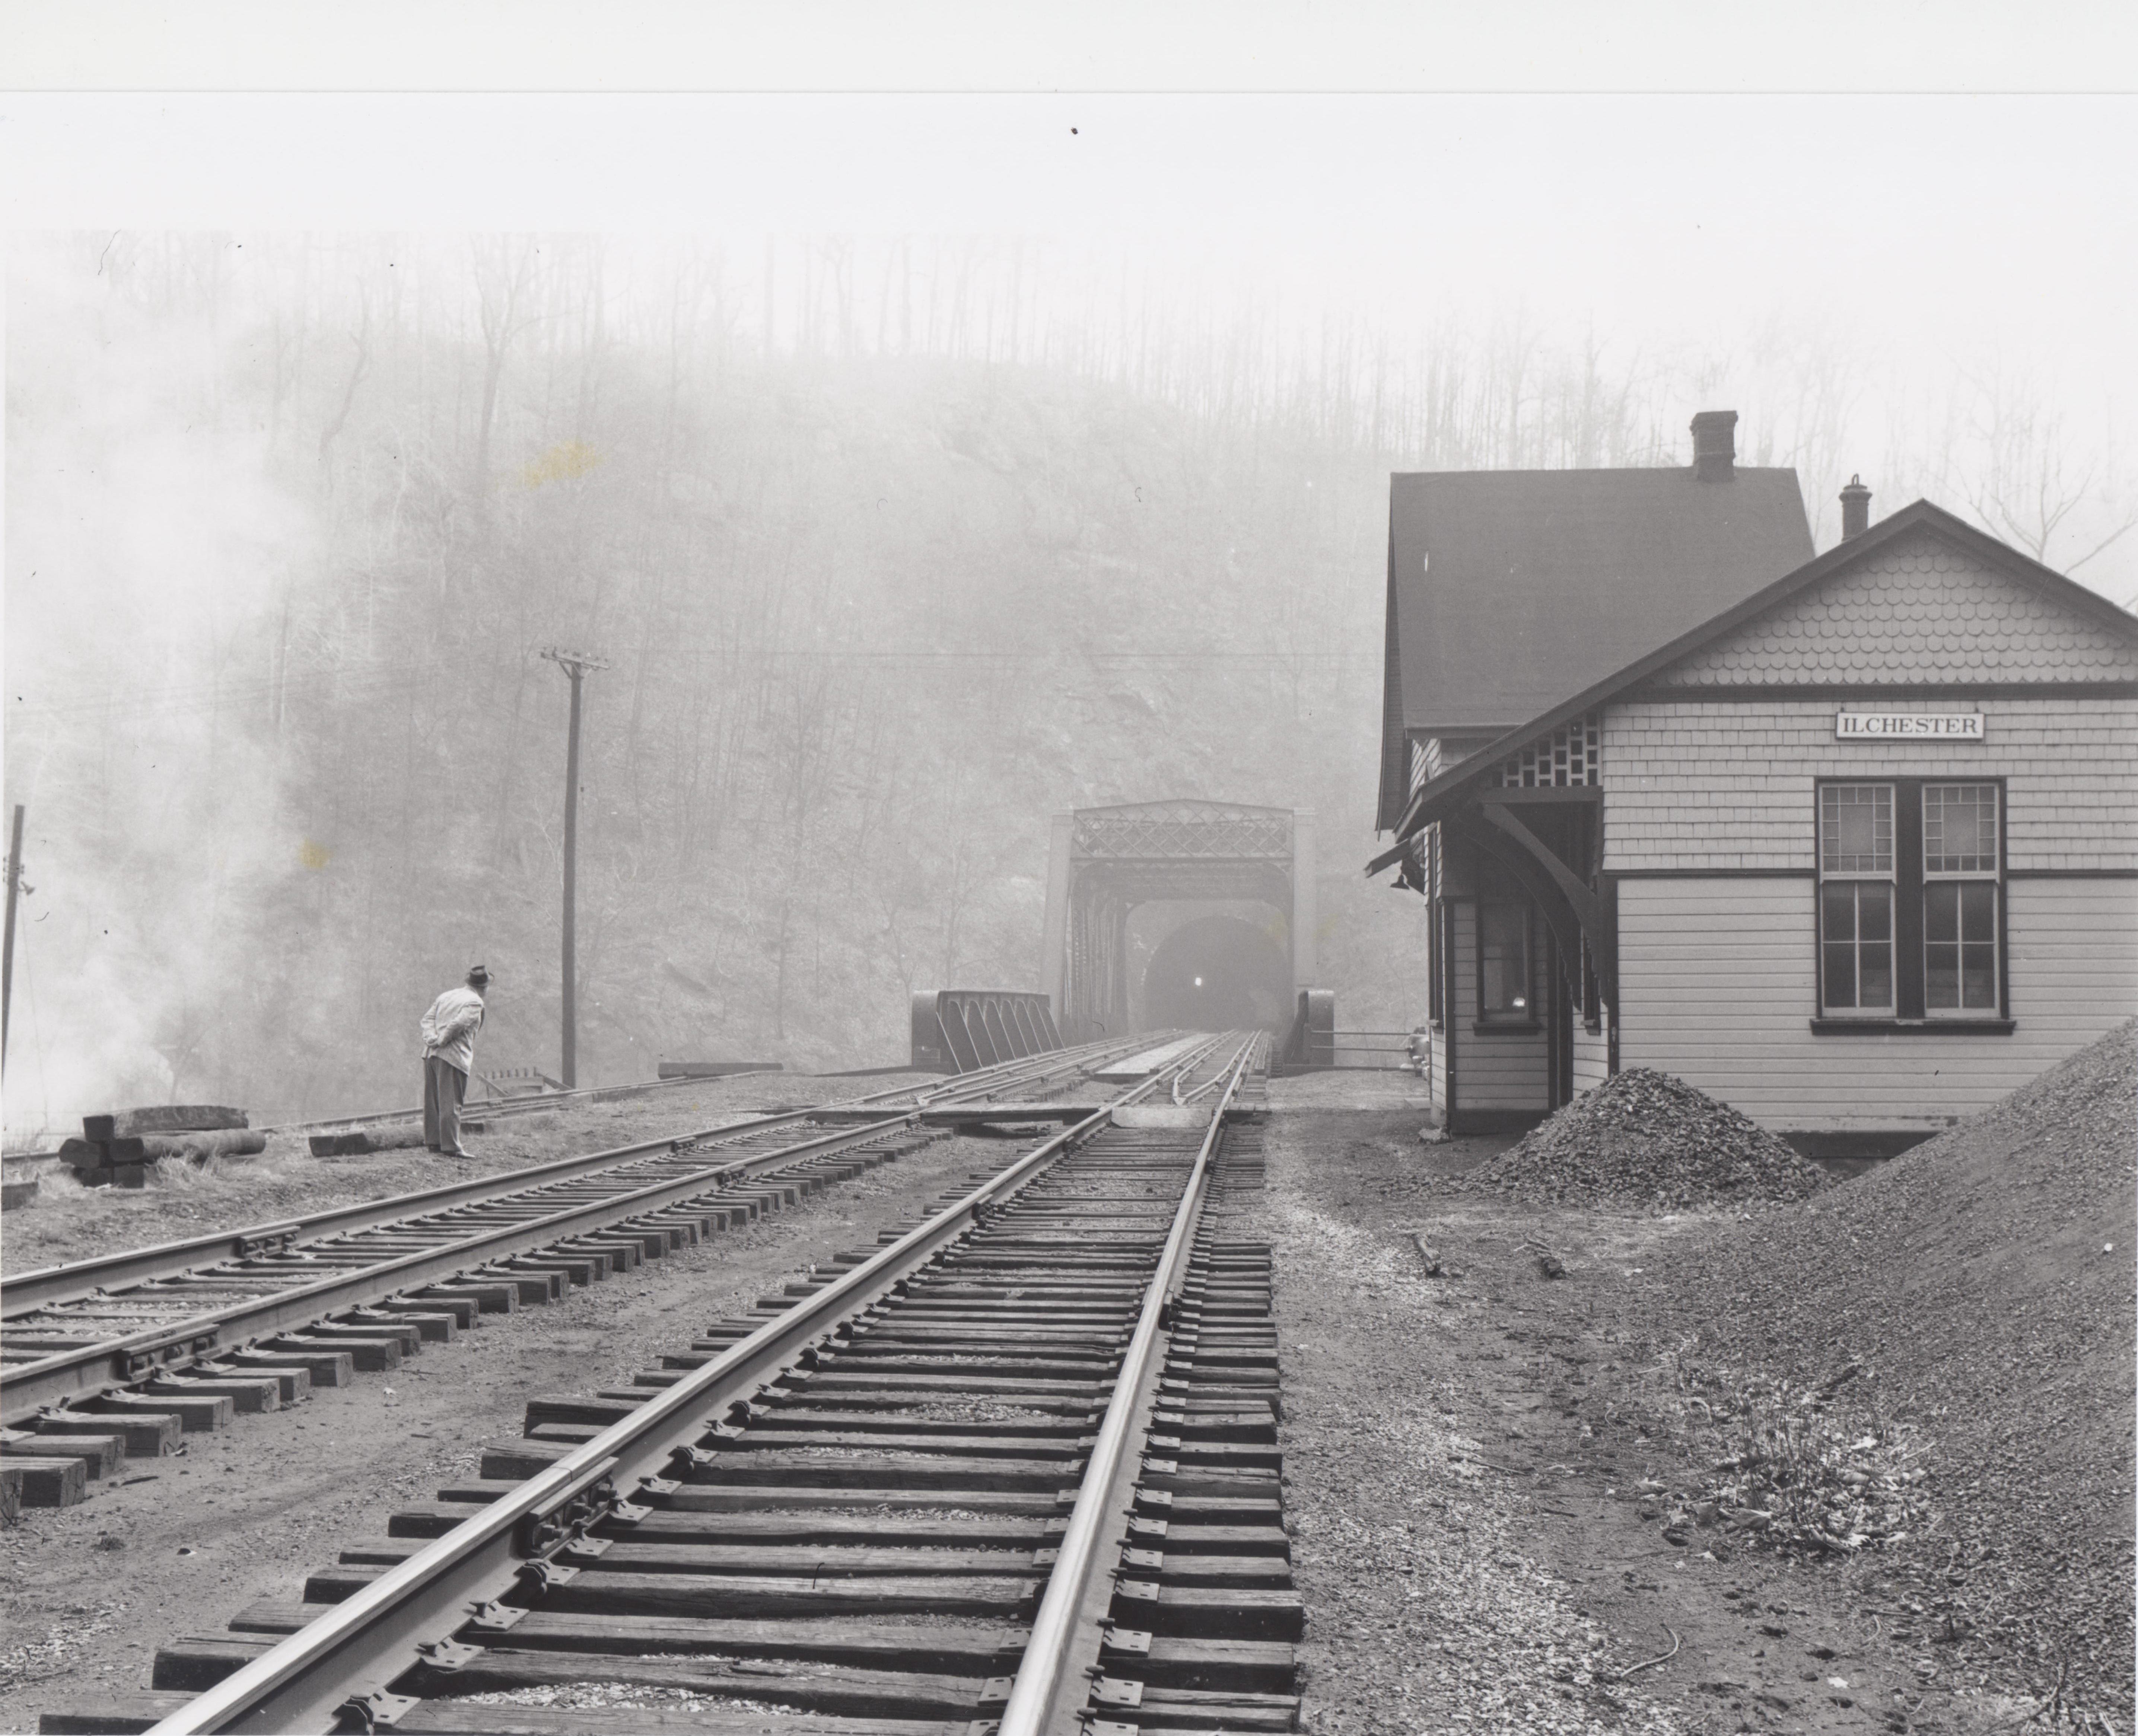 Ilchester Station 1 1959